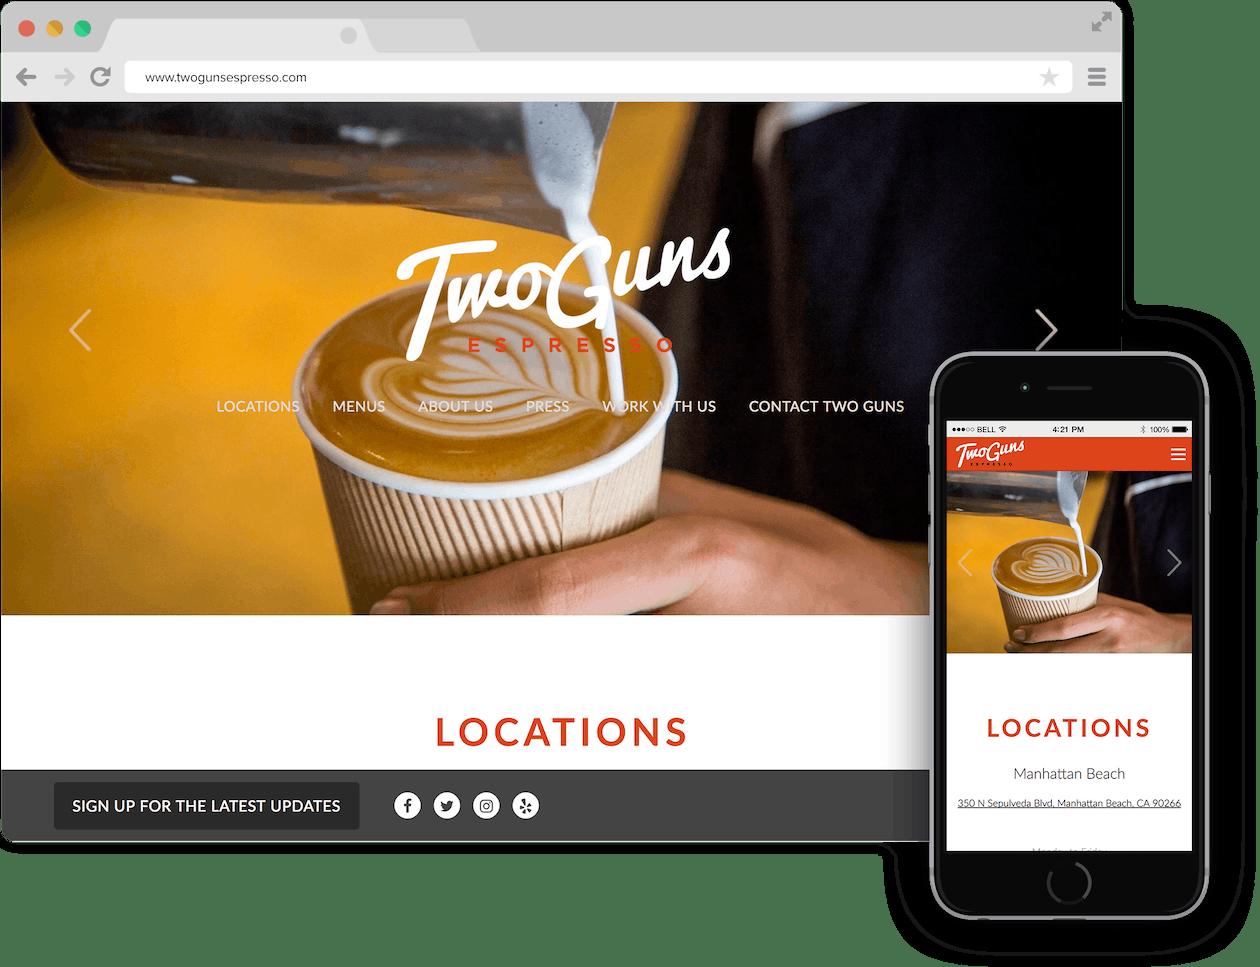 a screen shot of Two Guns Espresso website